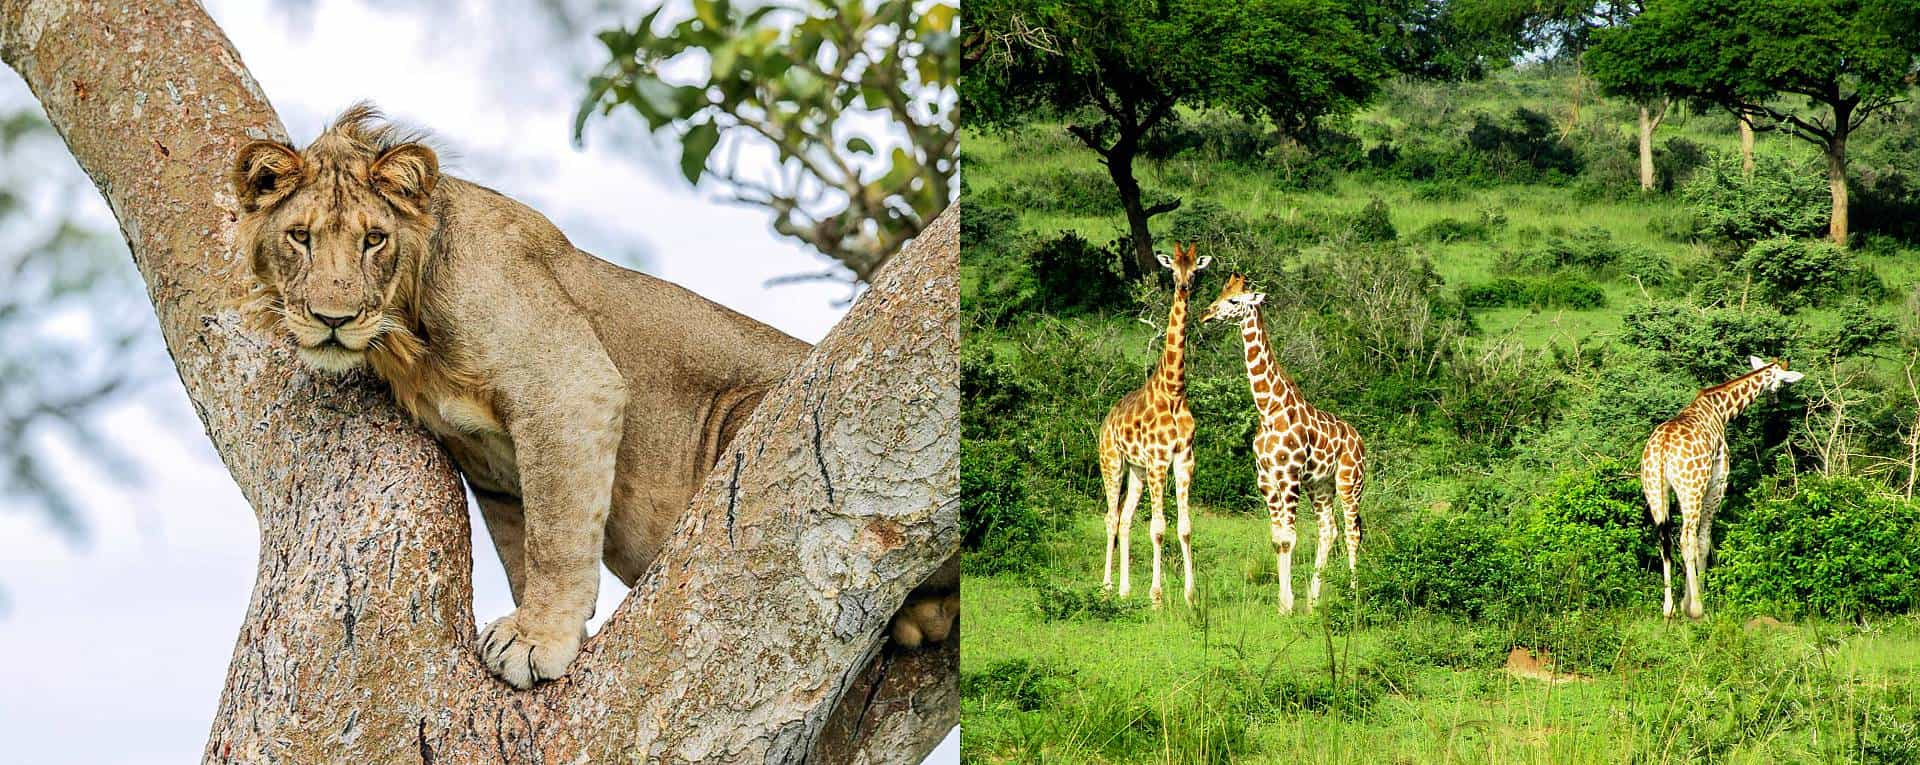 Wildlife Safari Trip Planning Guide For Uganda